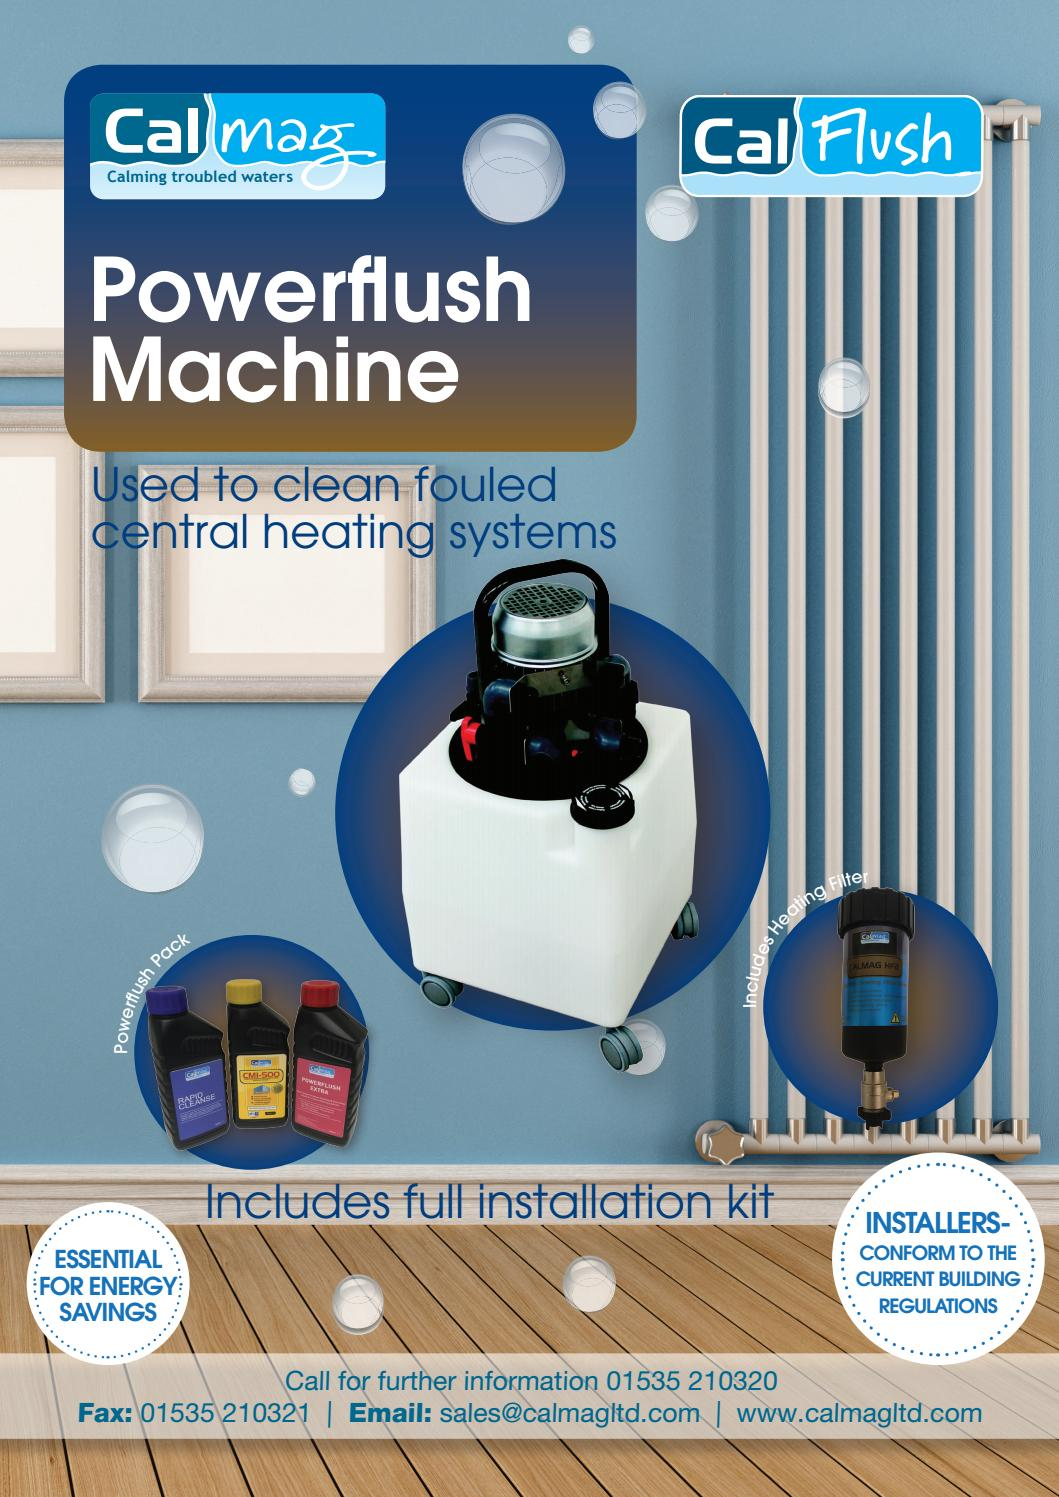 Calmag Powerflush brochure 2017 by Creative and Marketing - issuu